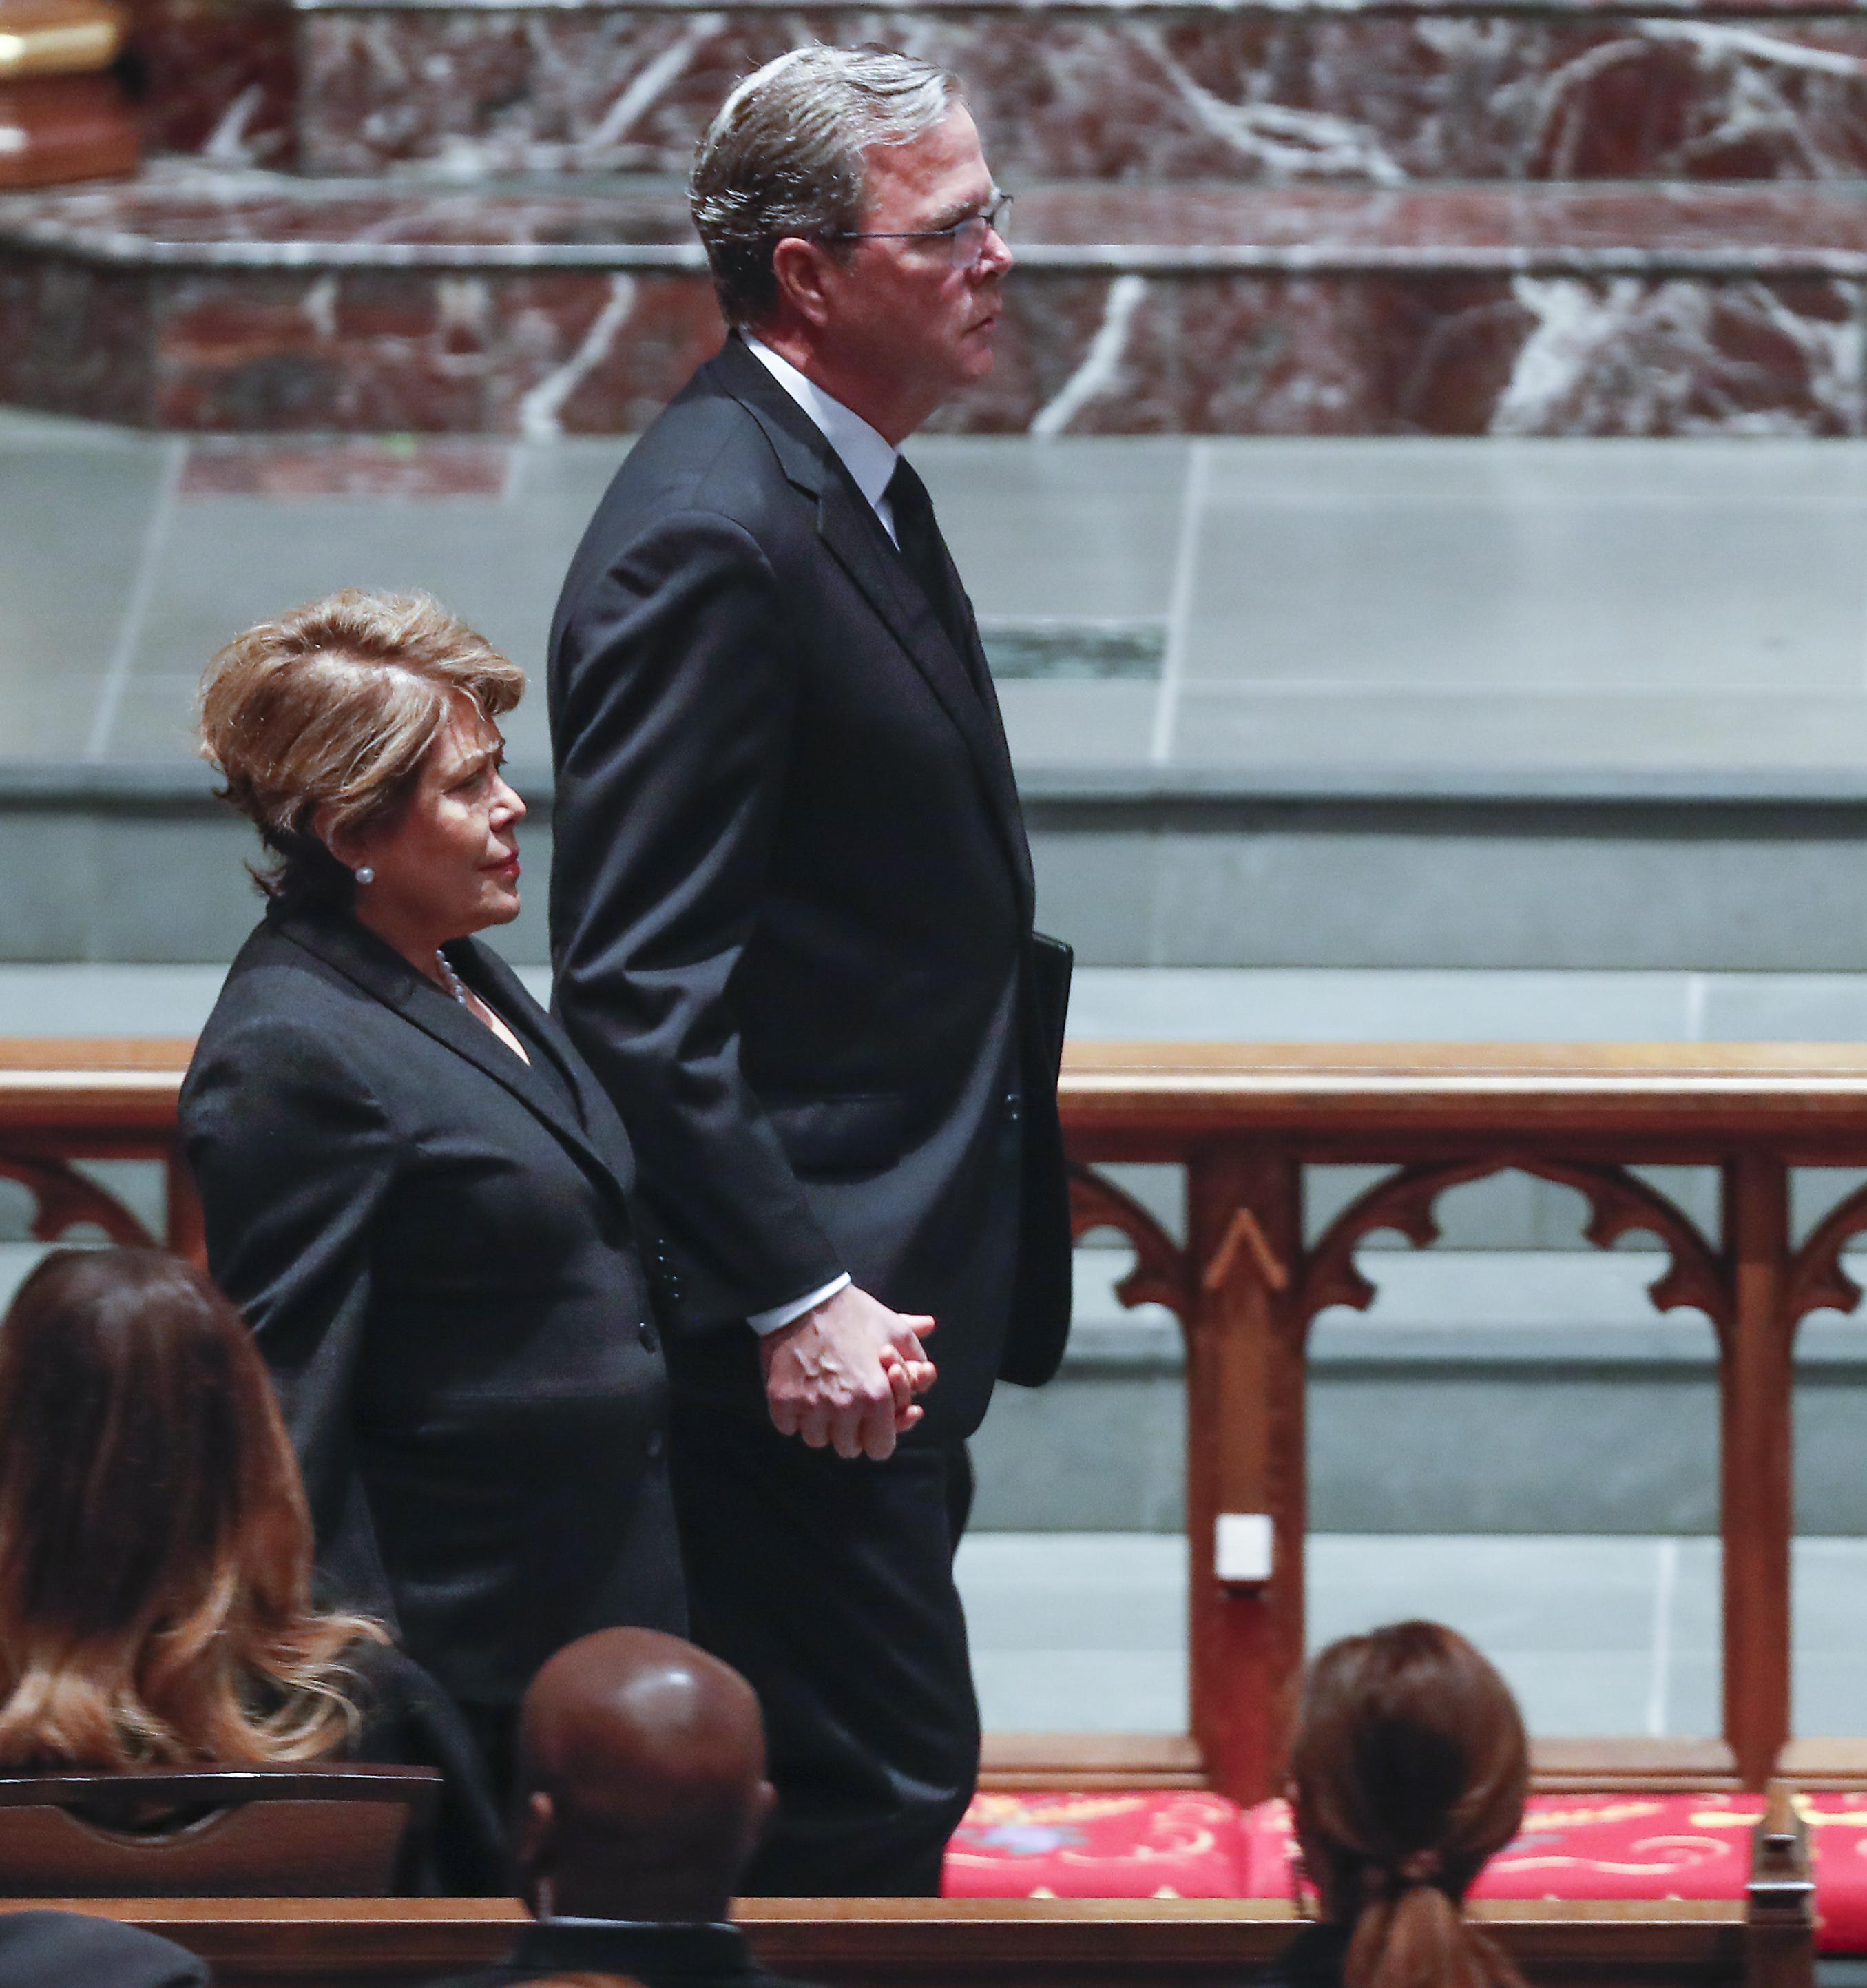 Former President George HW Bush hospitalized in ICU